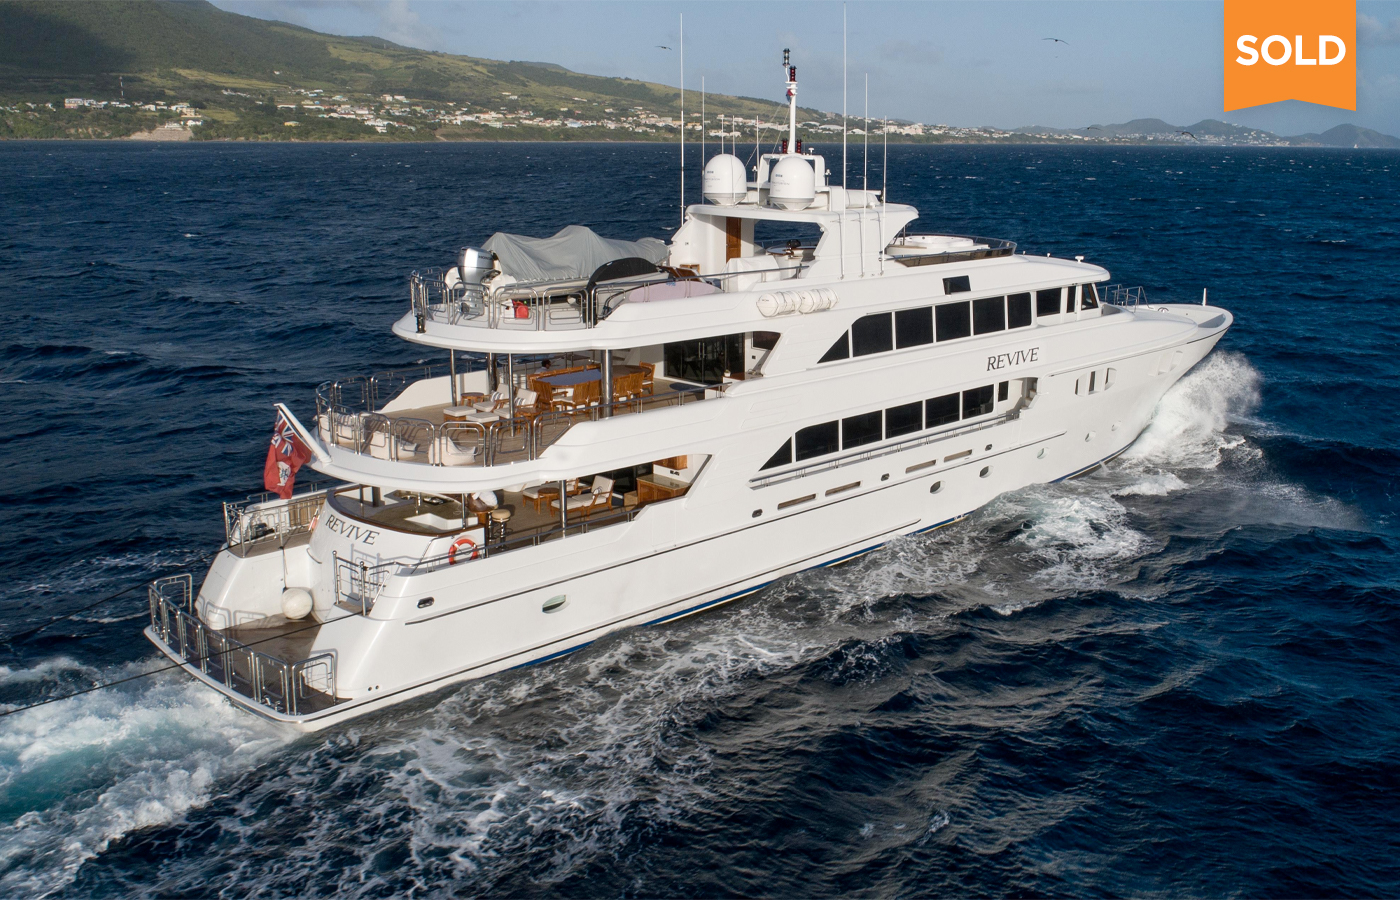 150 Richmond Superyacht Sold By Will Noftsinger + Chris Daves